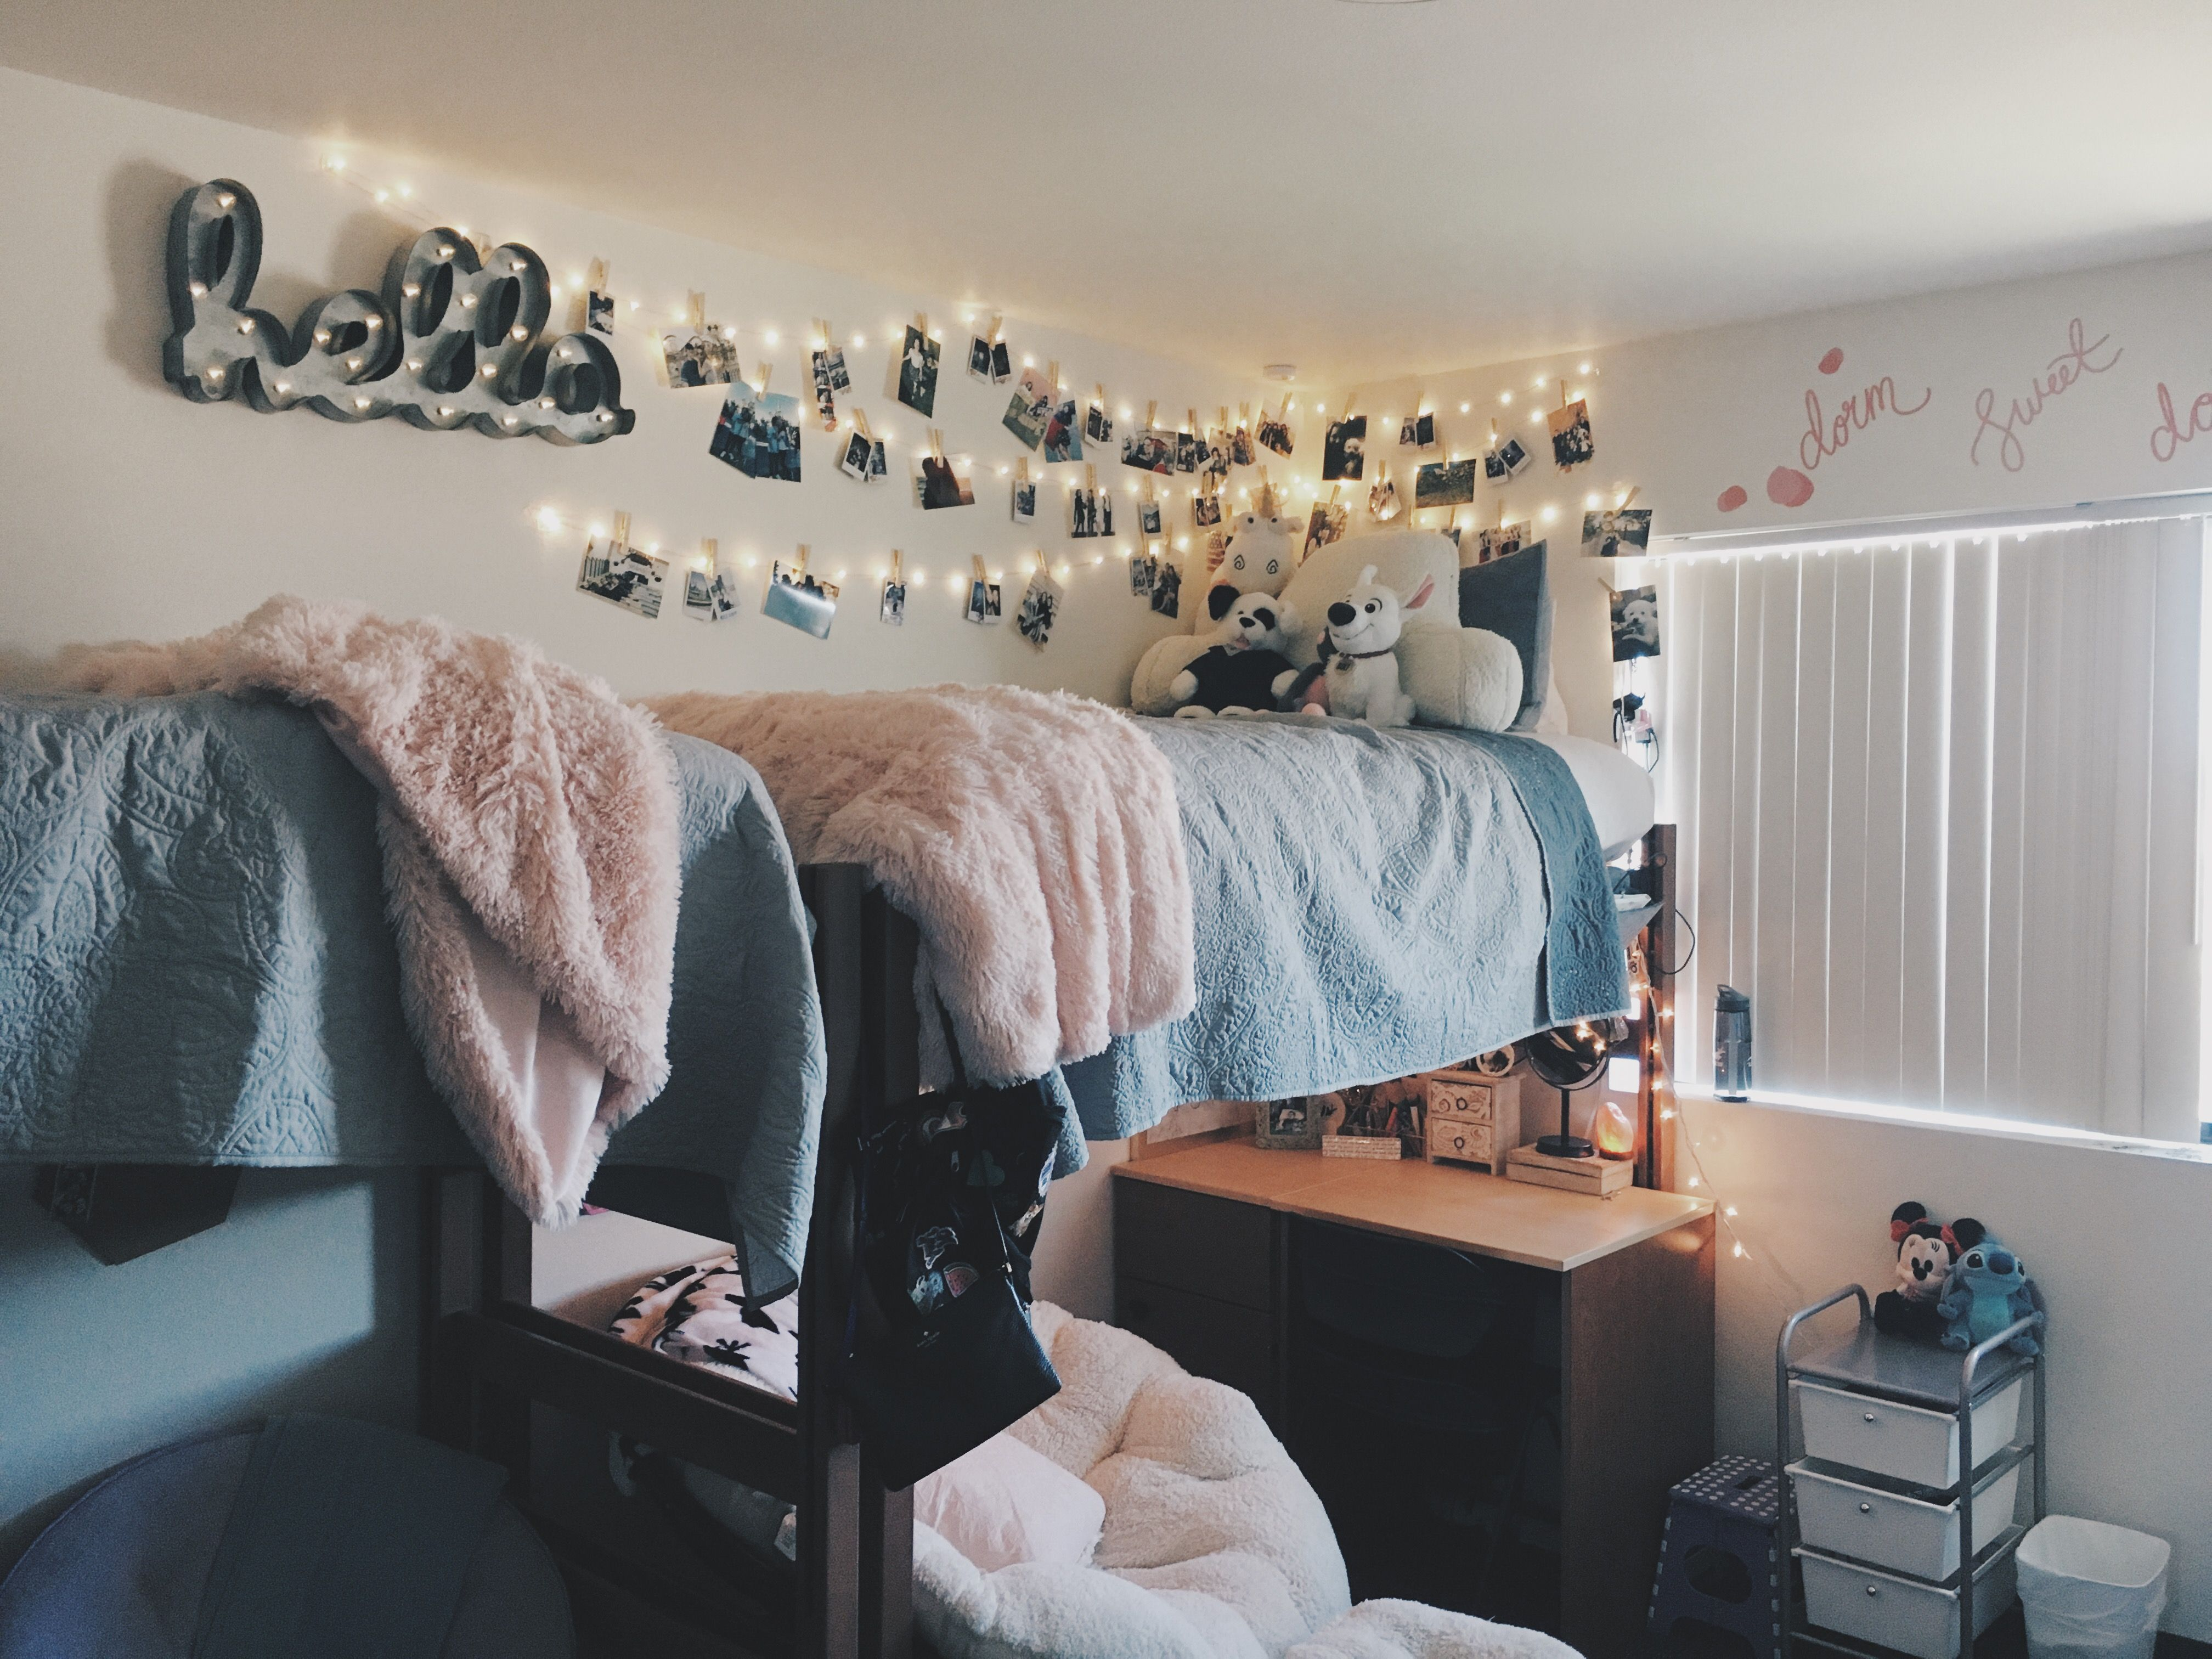 My Dorm Room At Grand Canyon University Dorm Dormroom Gcu Dorm Room Decor Dorm Room Inspiration College Room